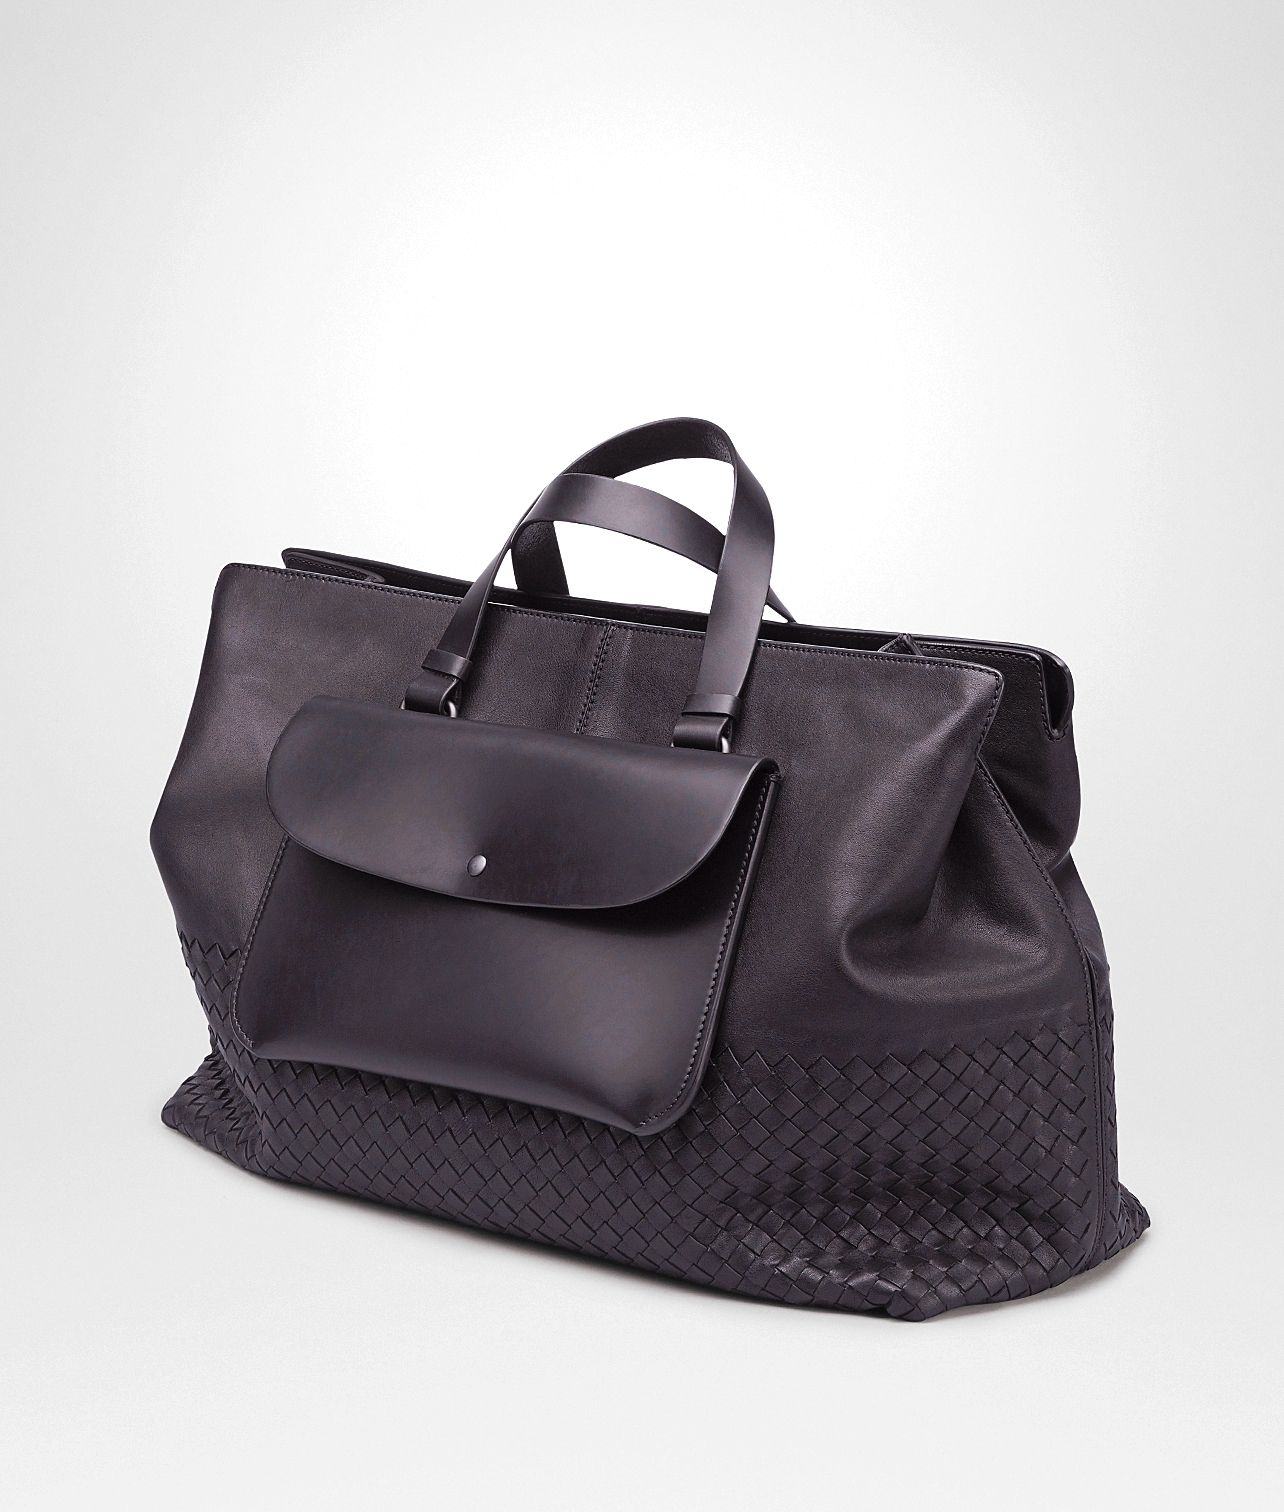 c5814b0c6db9 NERO INTRECCIATO NAPA LAVATA TOTE BAG - Men s Bottega Veneta Tote Bag -  Shop at the Official Online Store  bagsandpurses